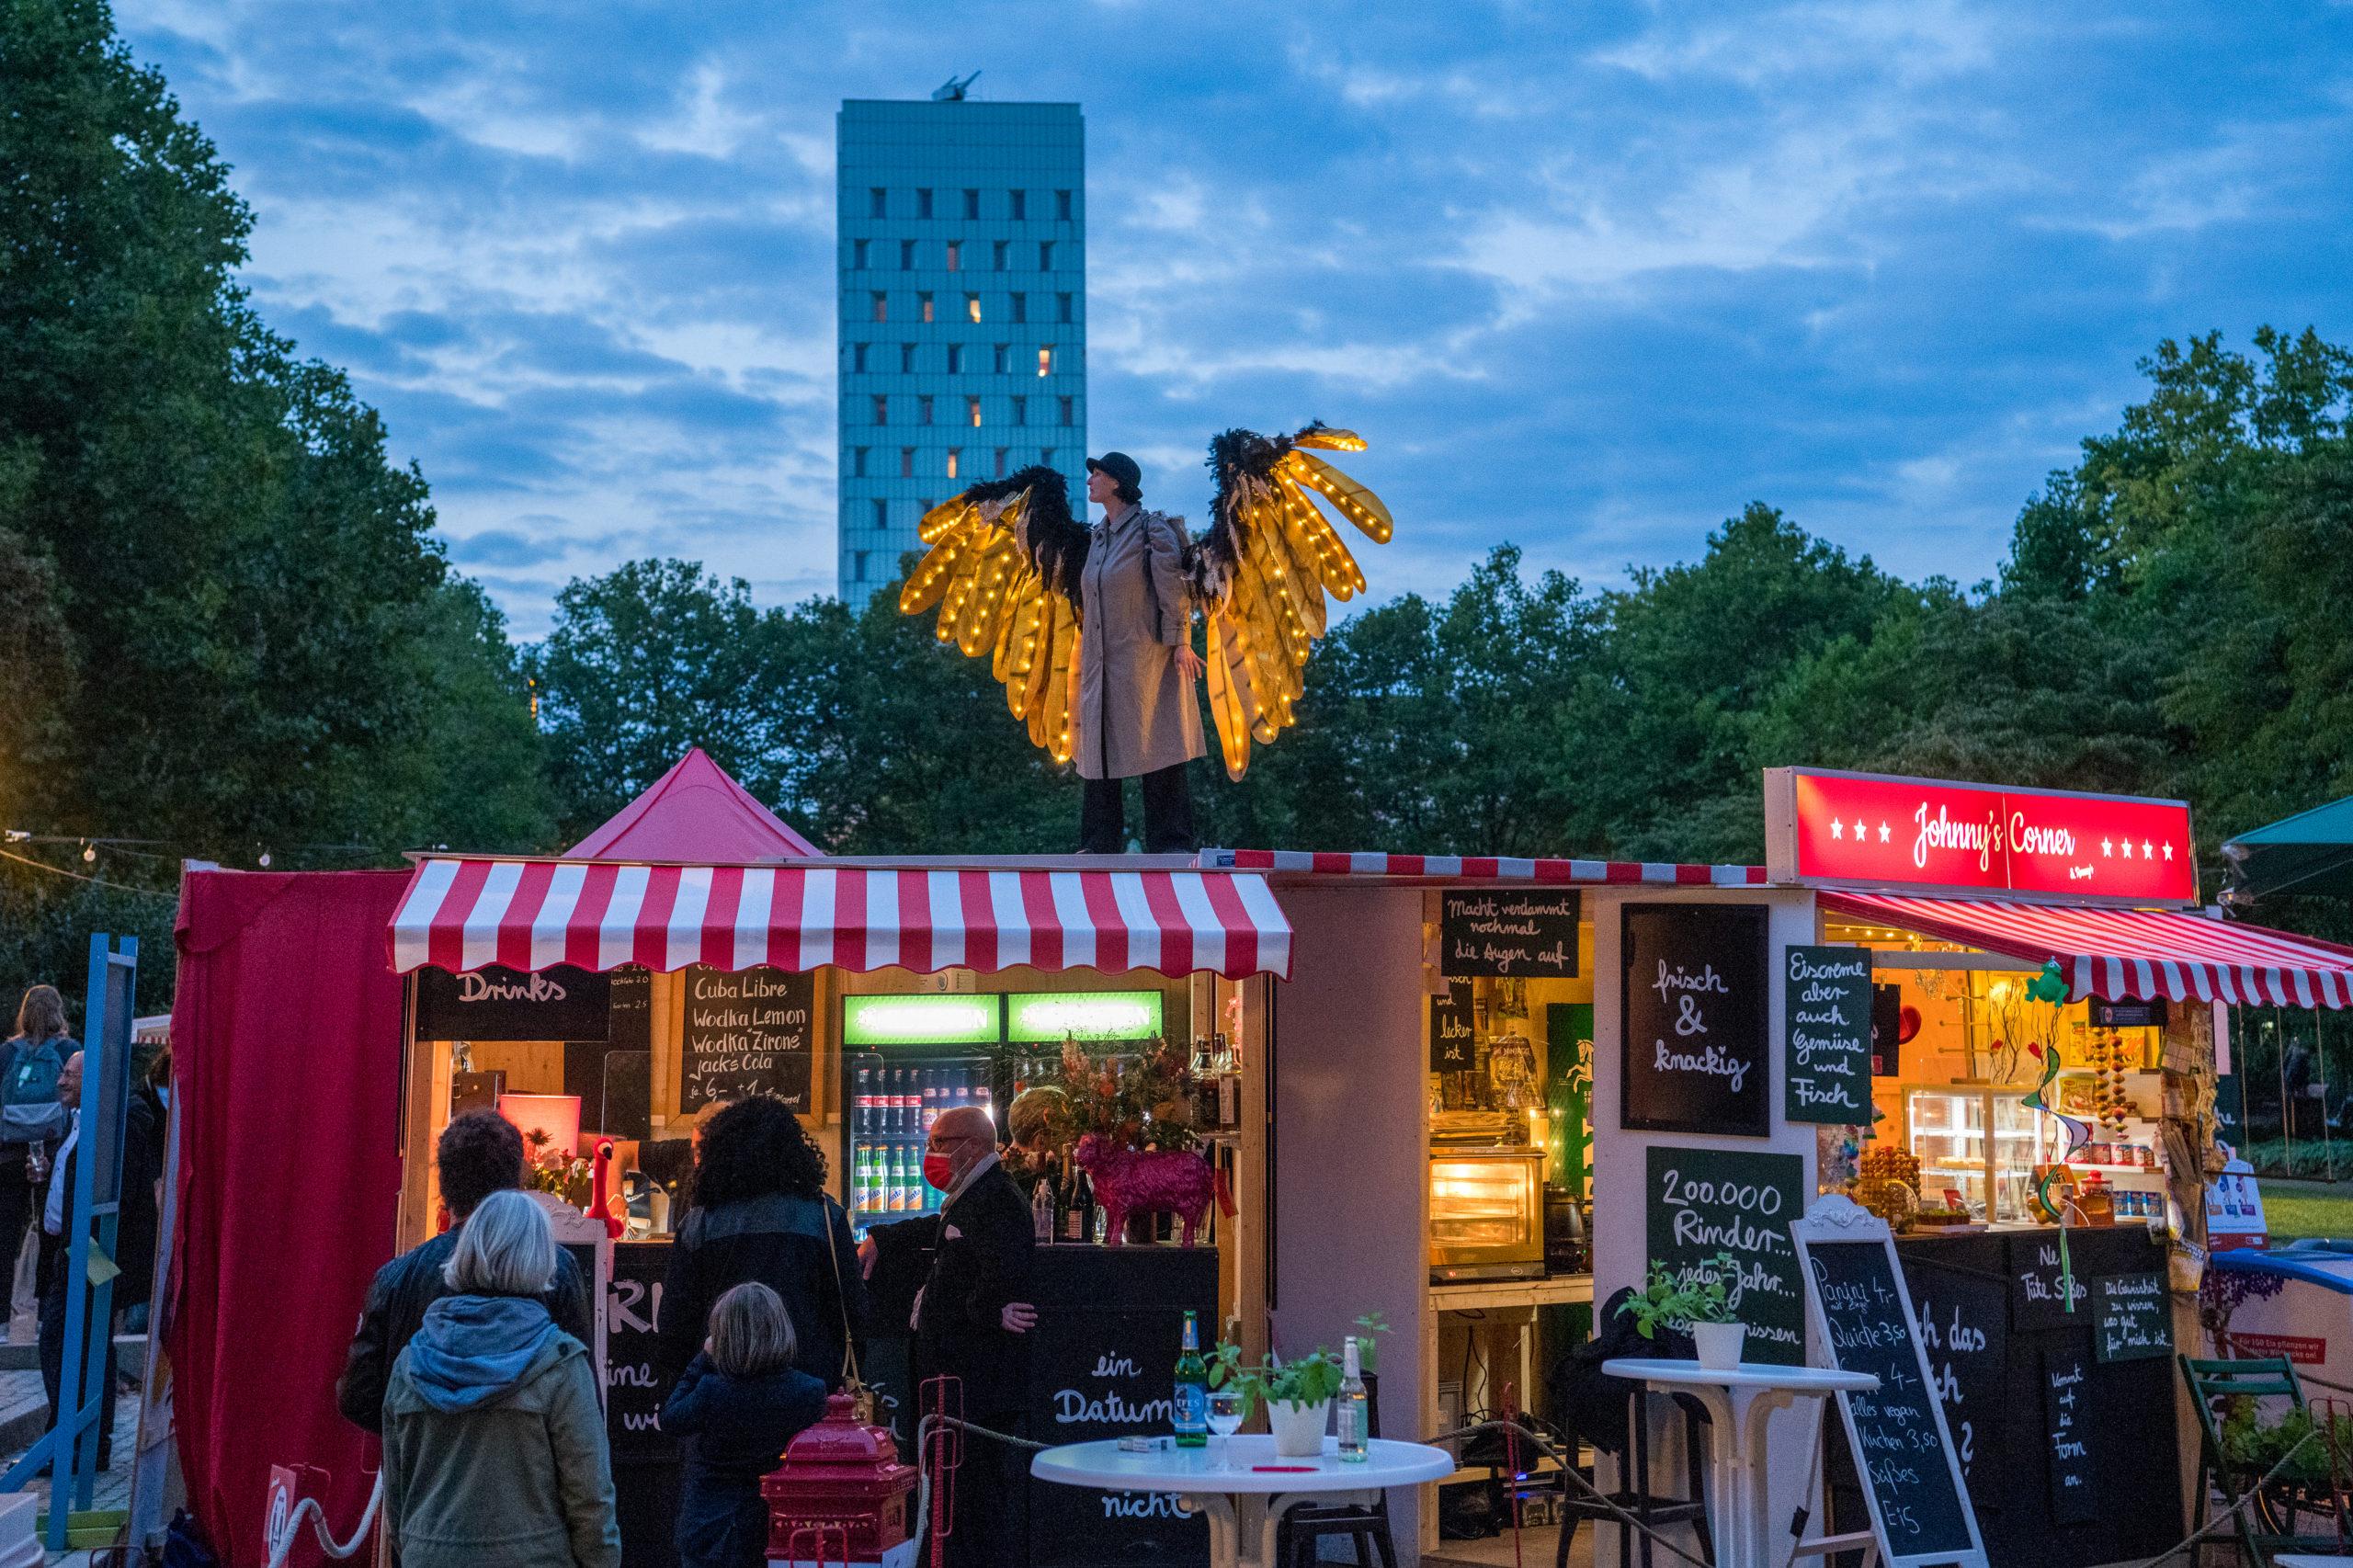 1 Angels, Altonale (Hamburg, Germany) 2020 (Photo by Thomas Panzau)